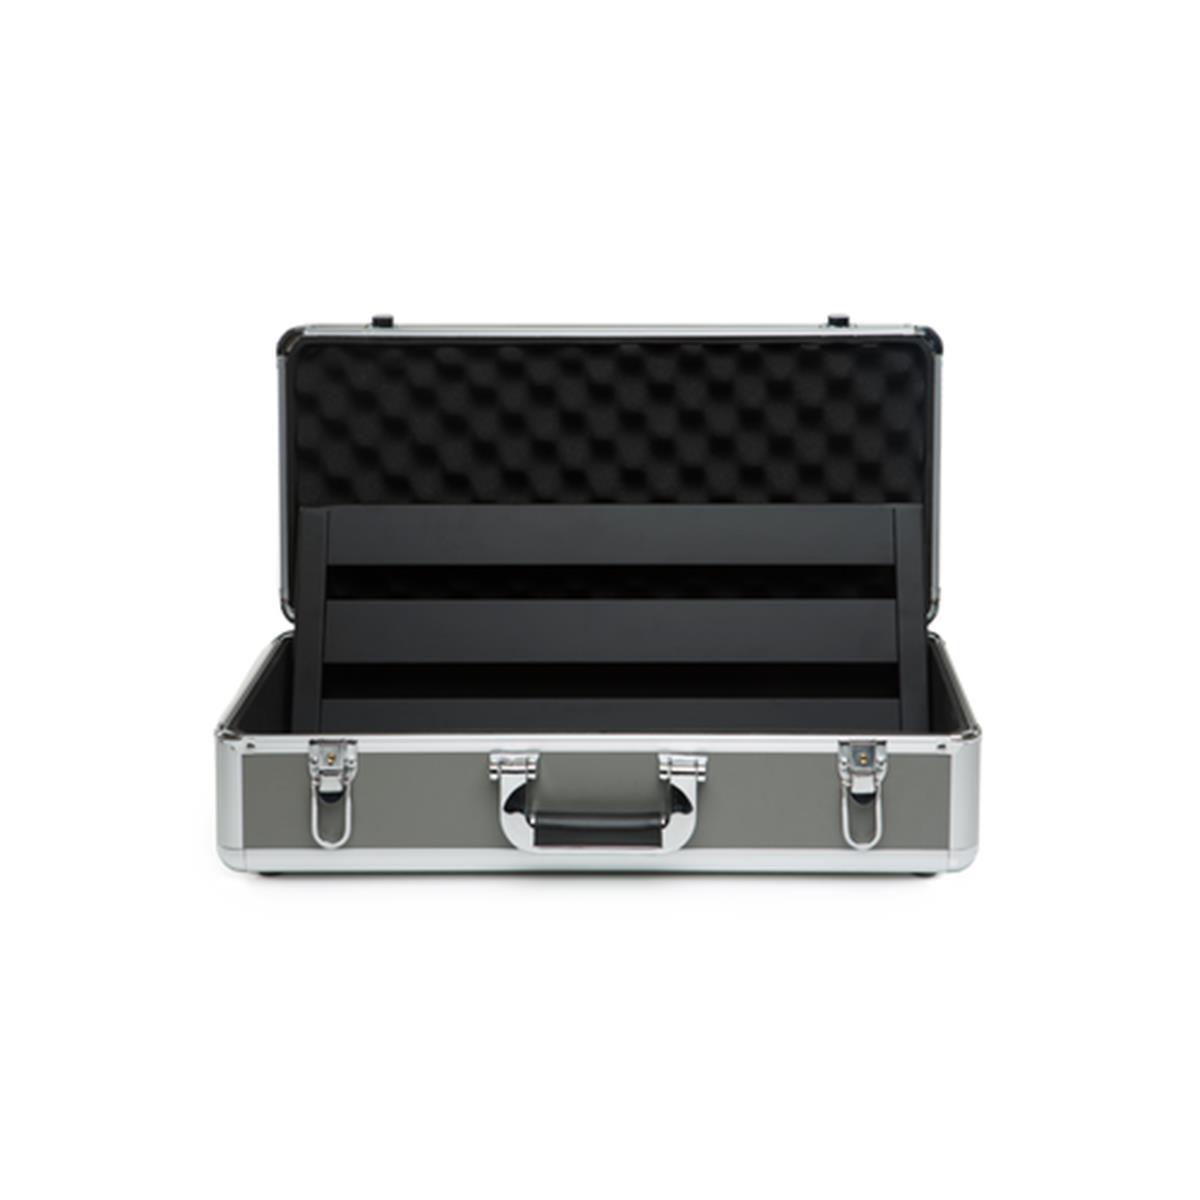 PEDALTRAIN-METRO-20-HARD-CASE-pedal-board-sku-14718